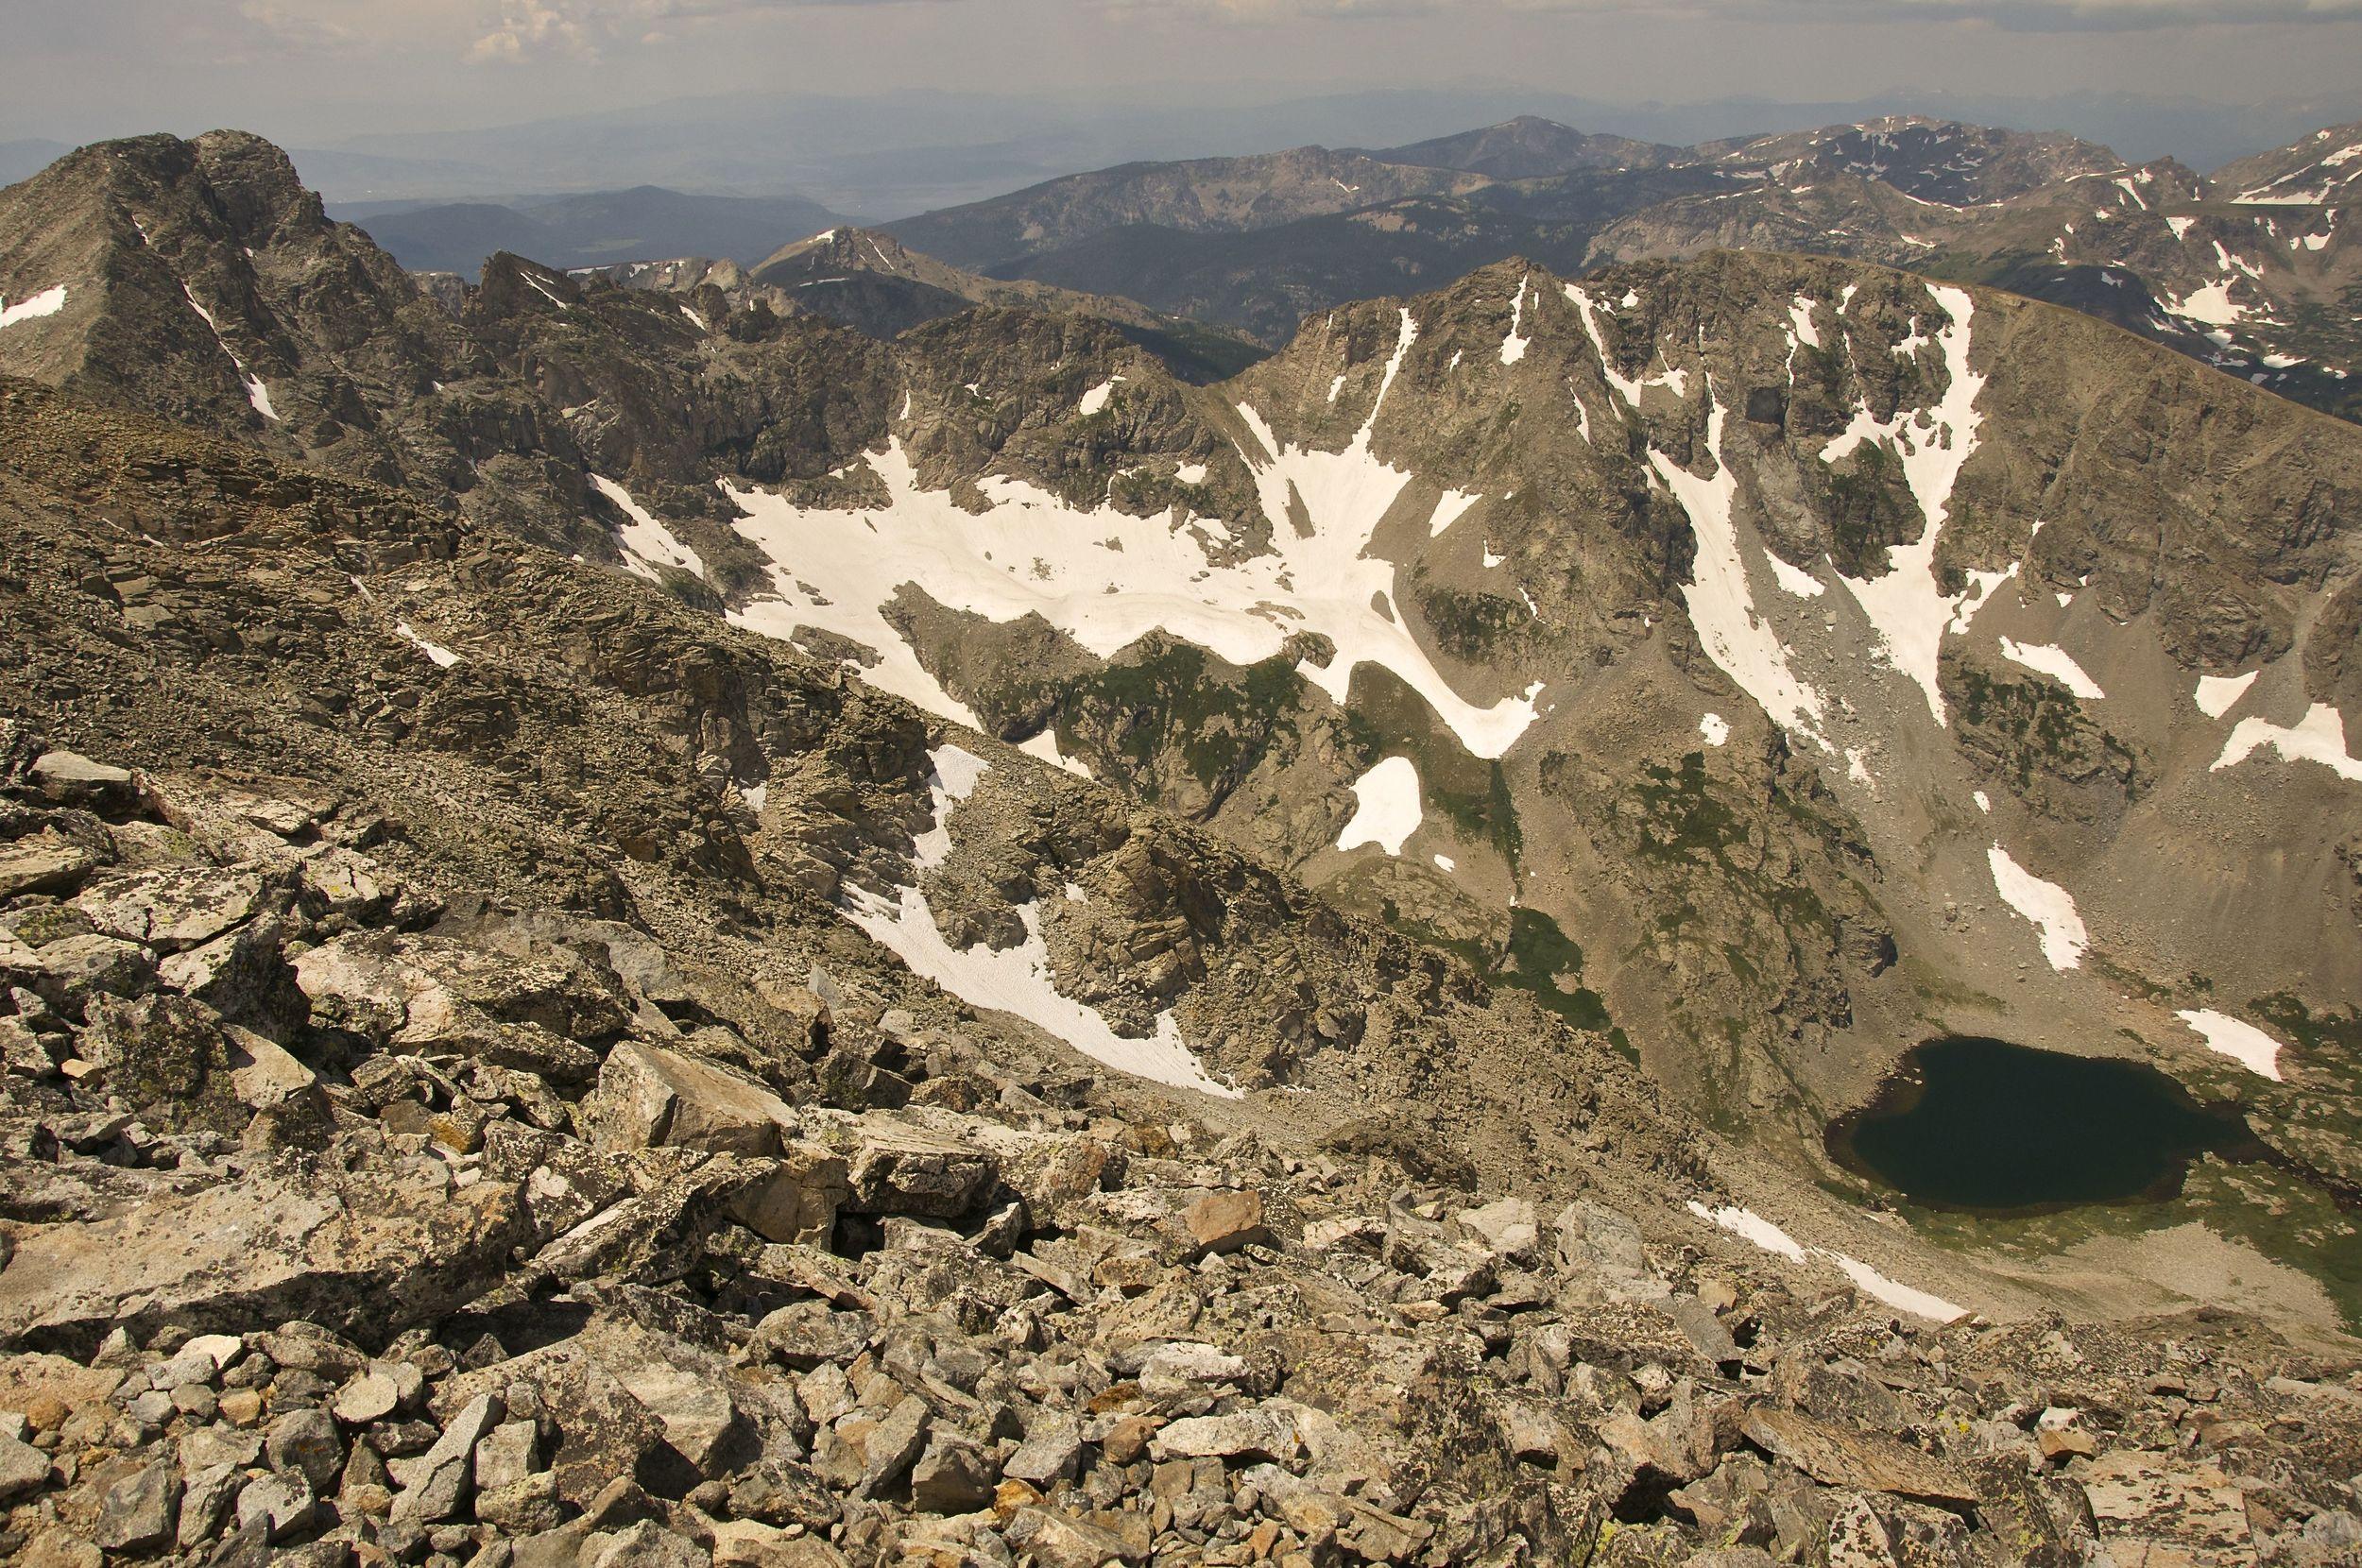 Mt. Audubon